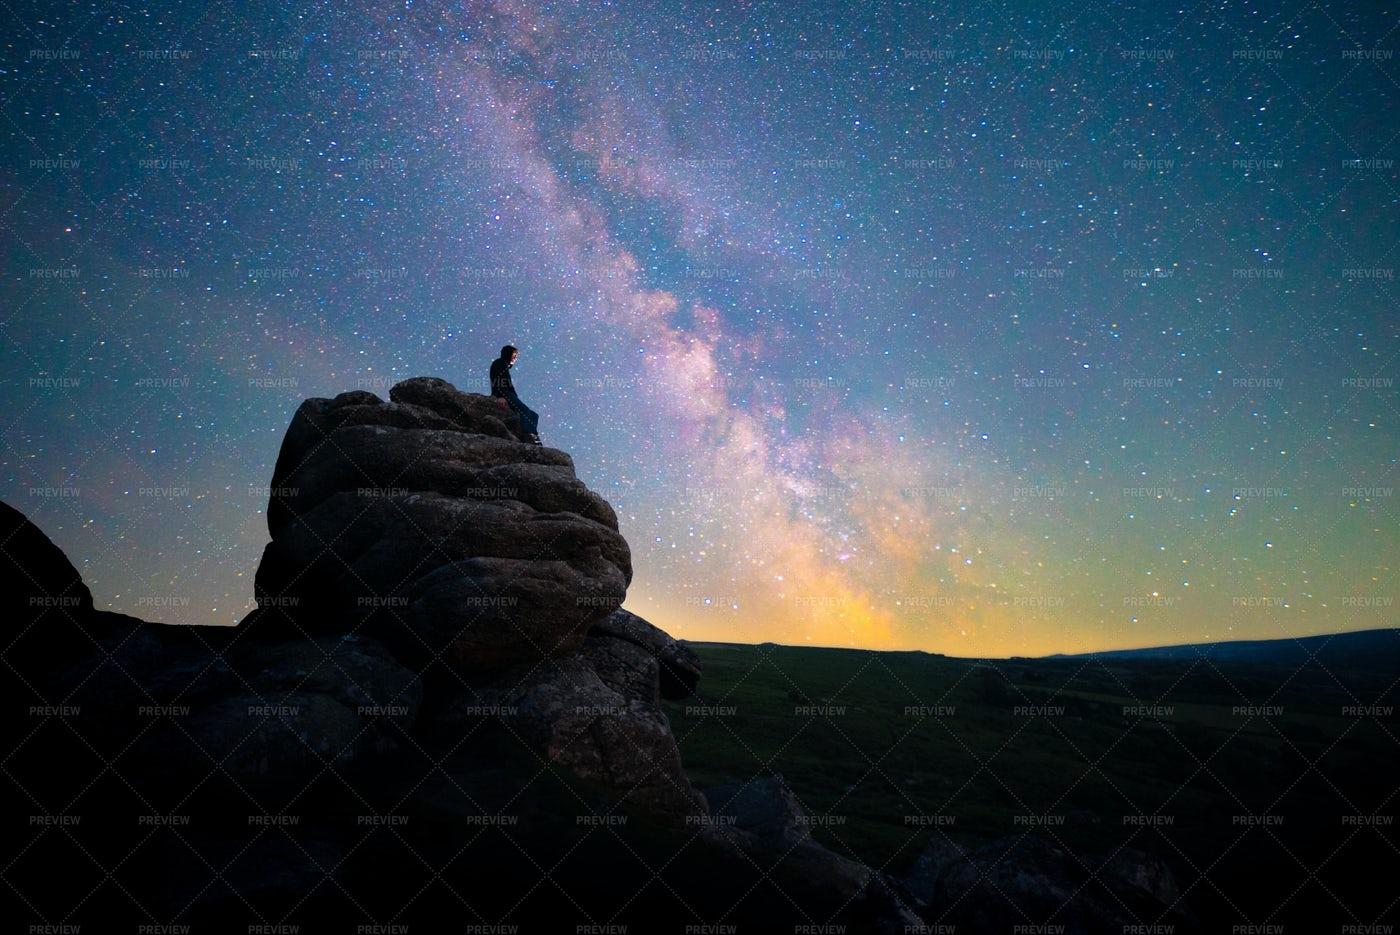 Stargazing The Milky Way: Stock Photos